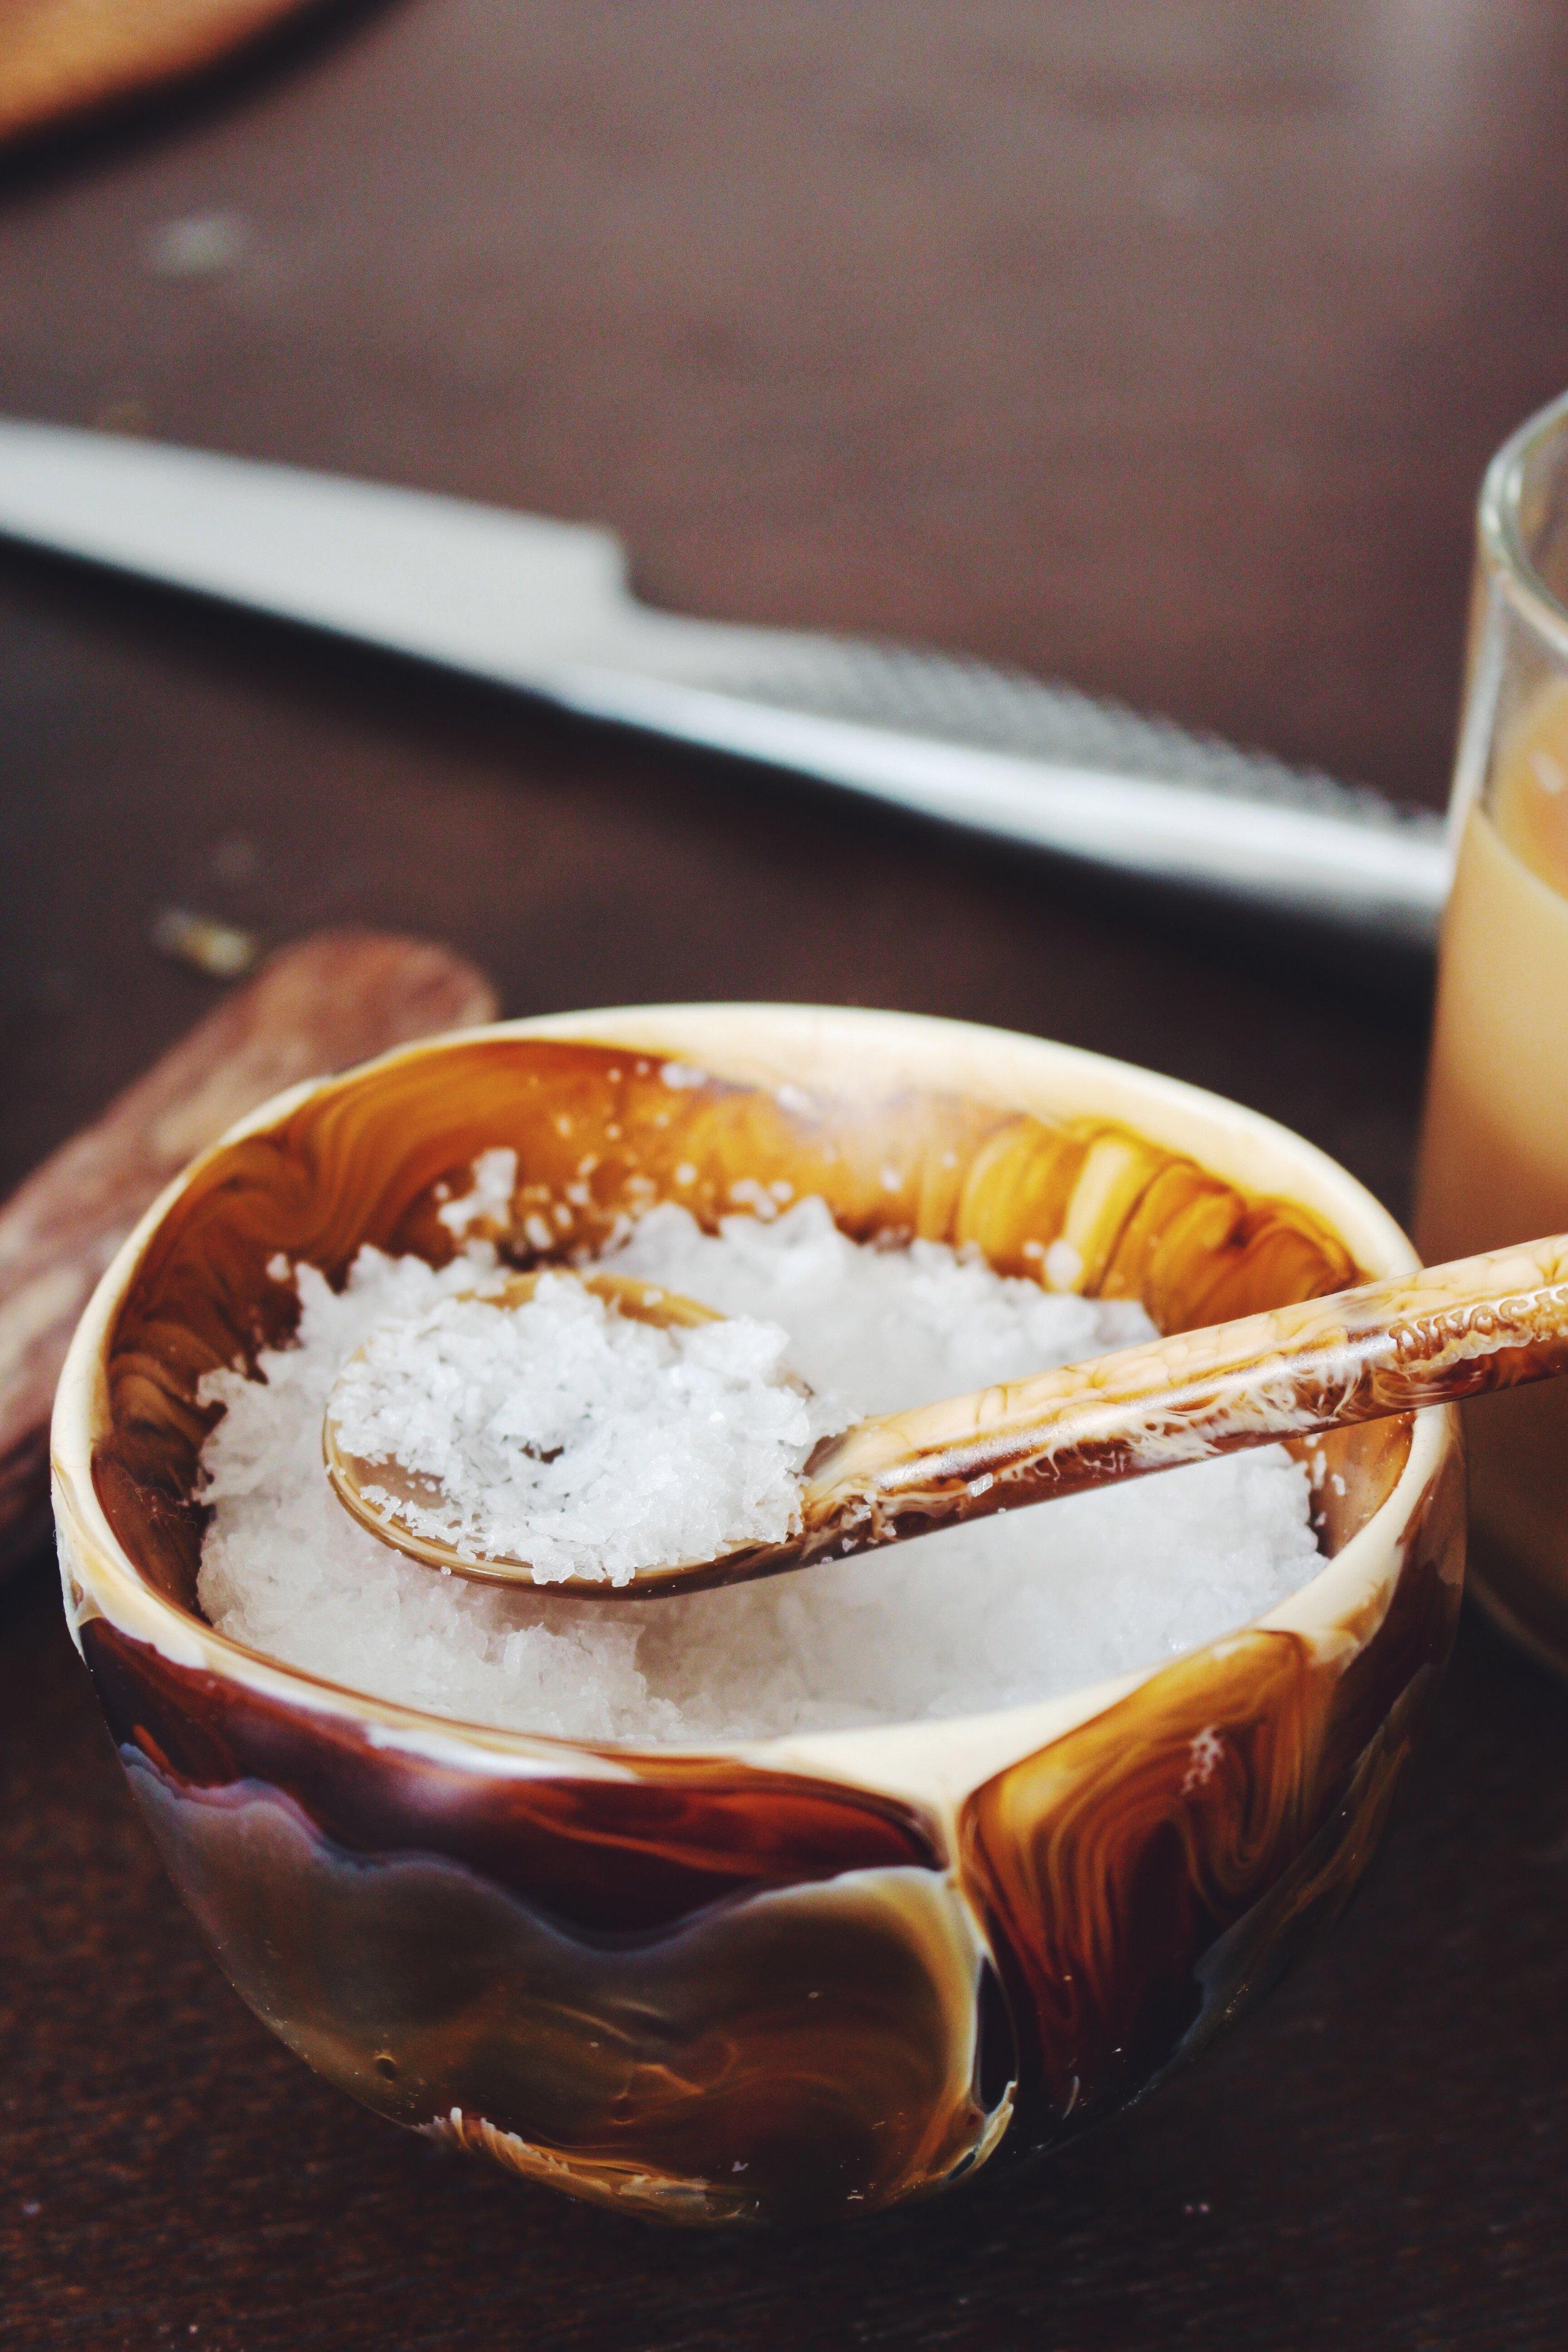 salt up close in bowl alone copy.jpg